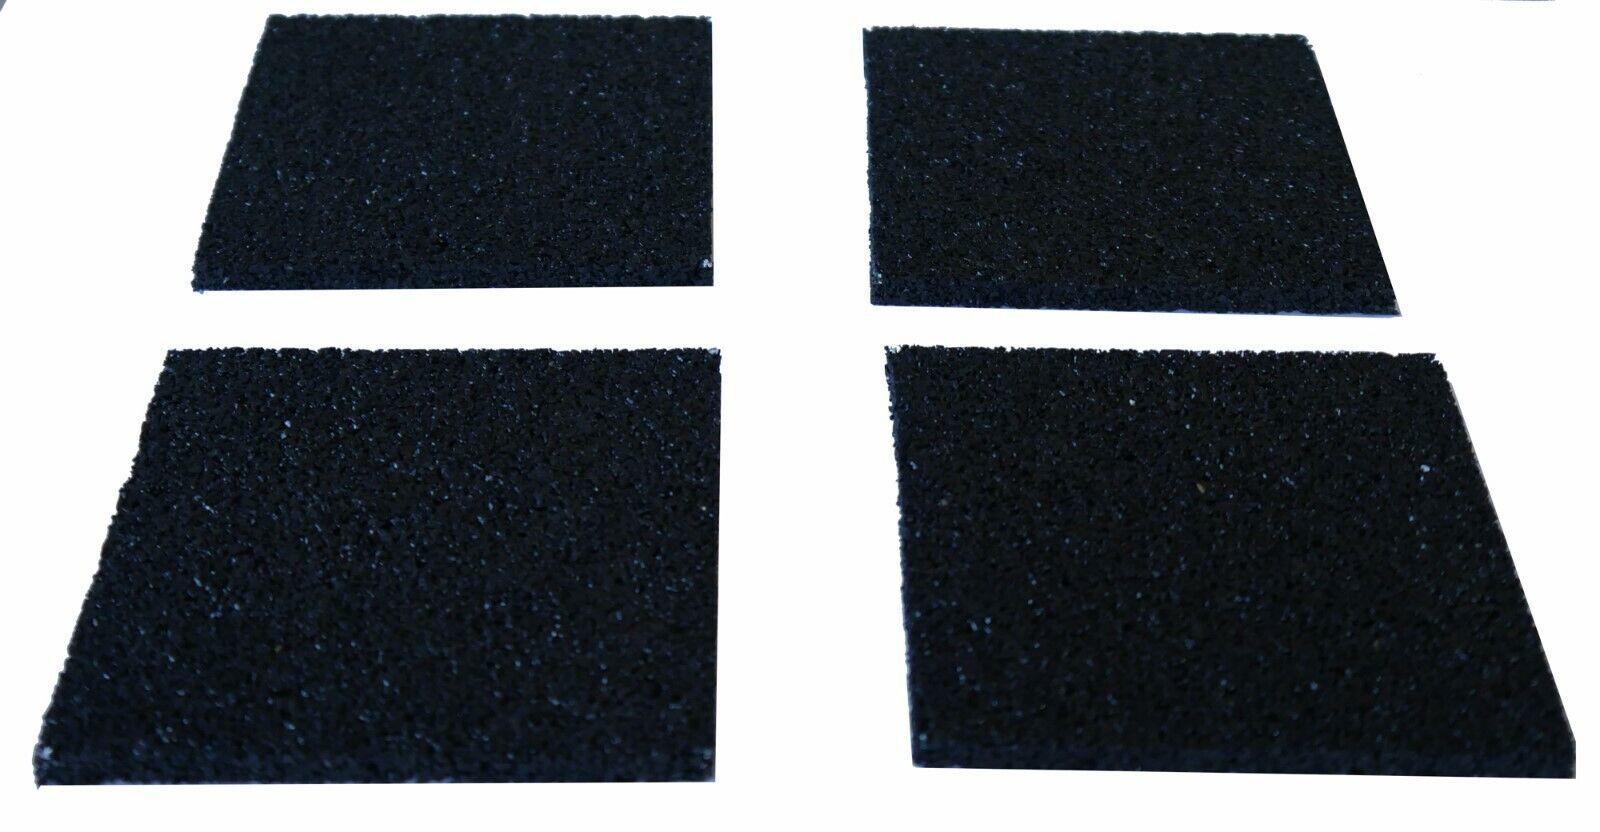 Antivibrationsmatte 4 St. Pads 10x10x1cm 2.Wahl Antirutschmatte Waschmaschine